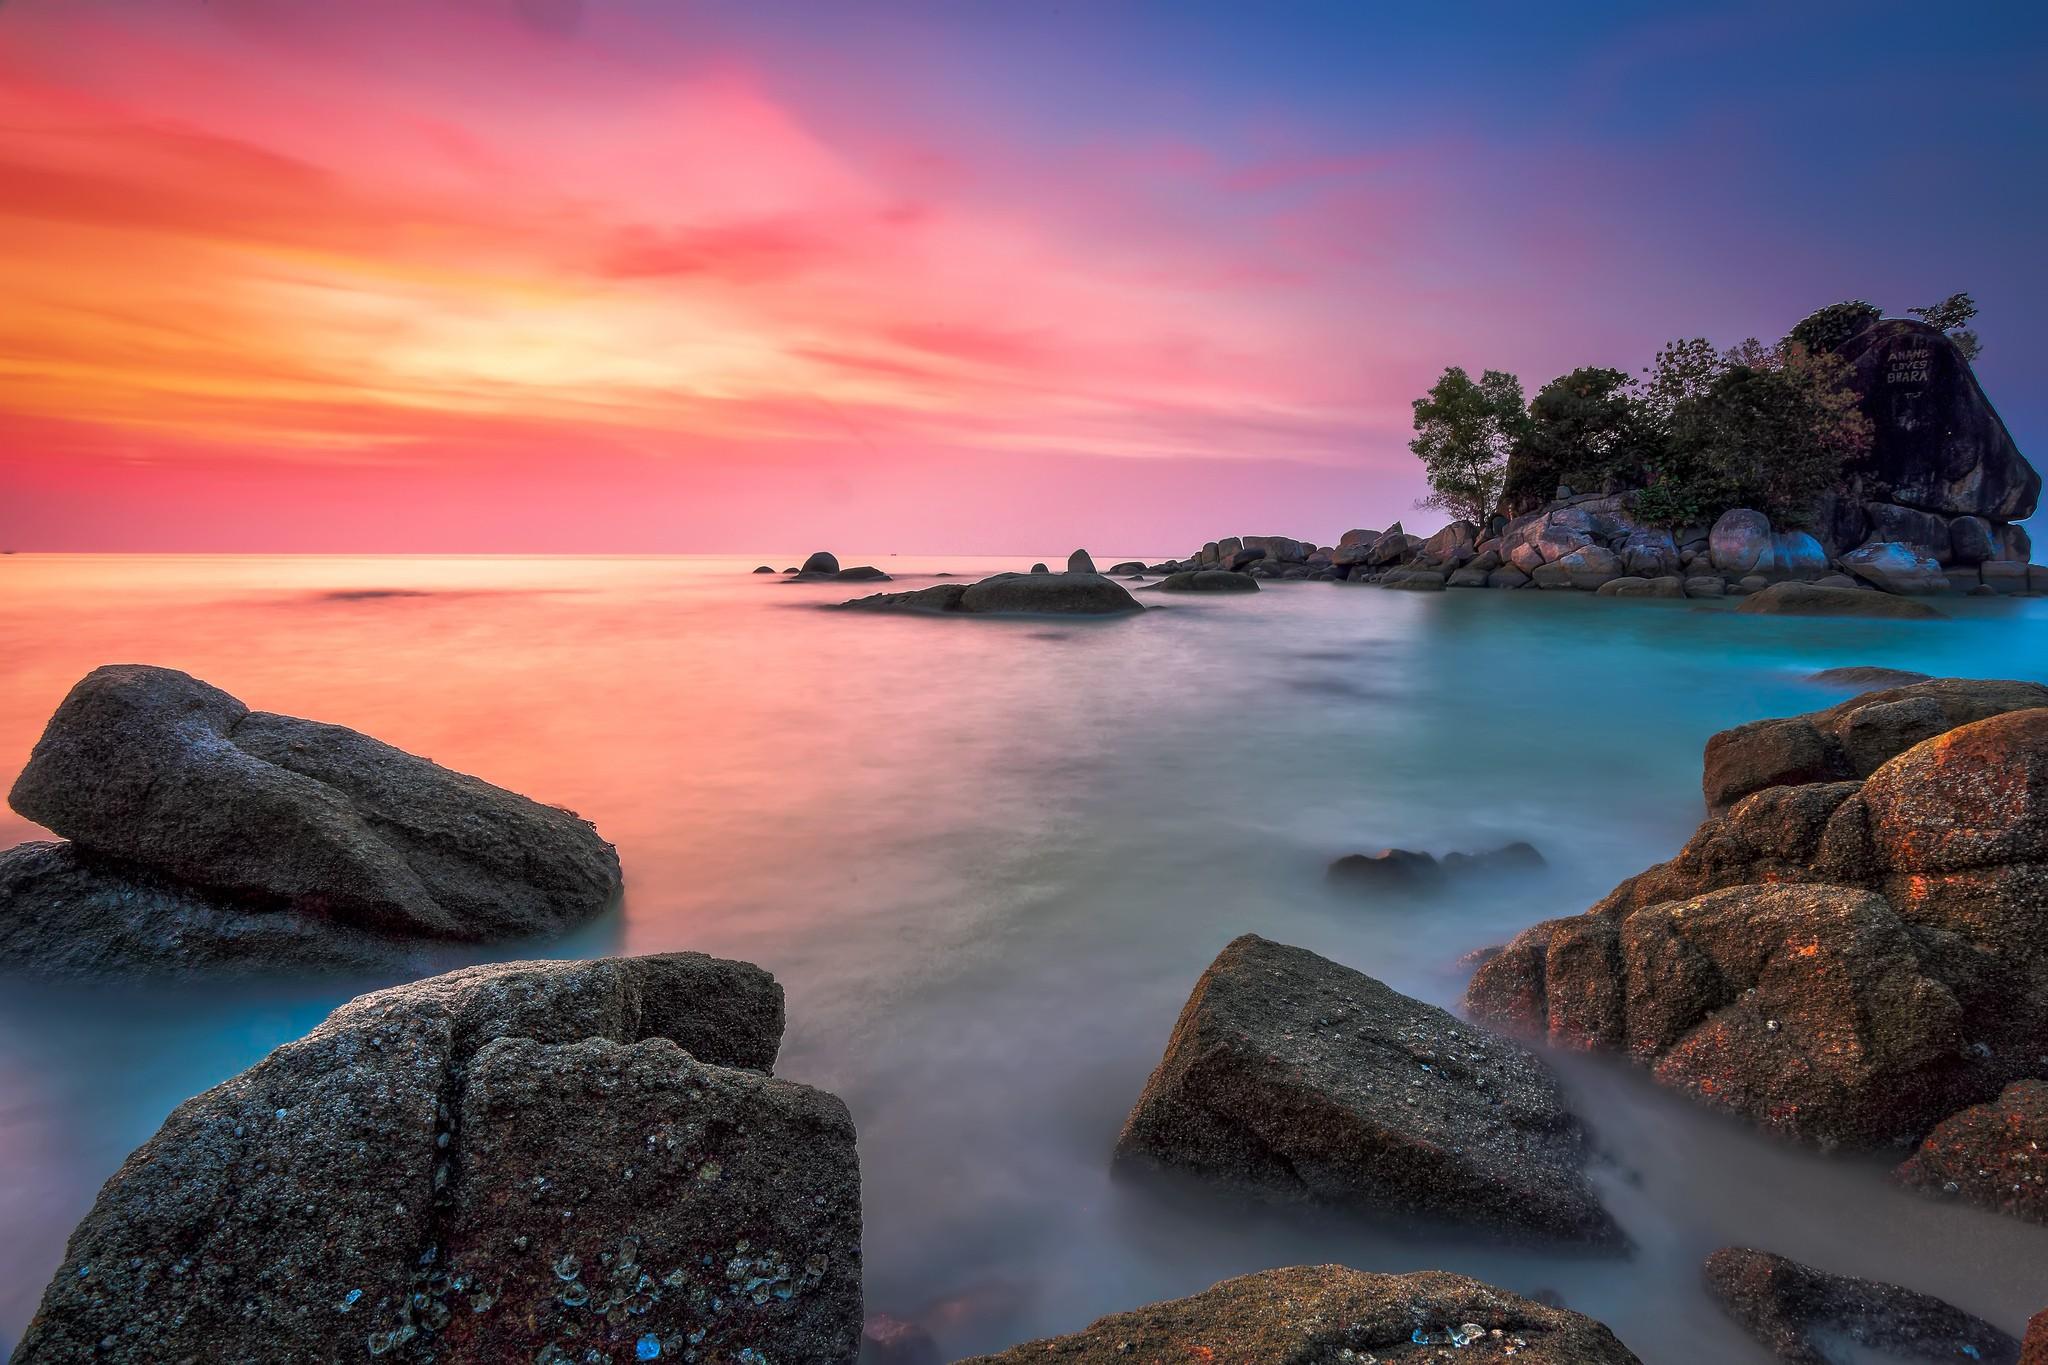 Beautiful Sea Coast, Hd Nature, 4K Wallpapers, Images -9387